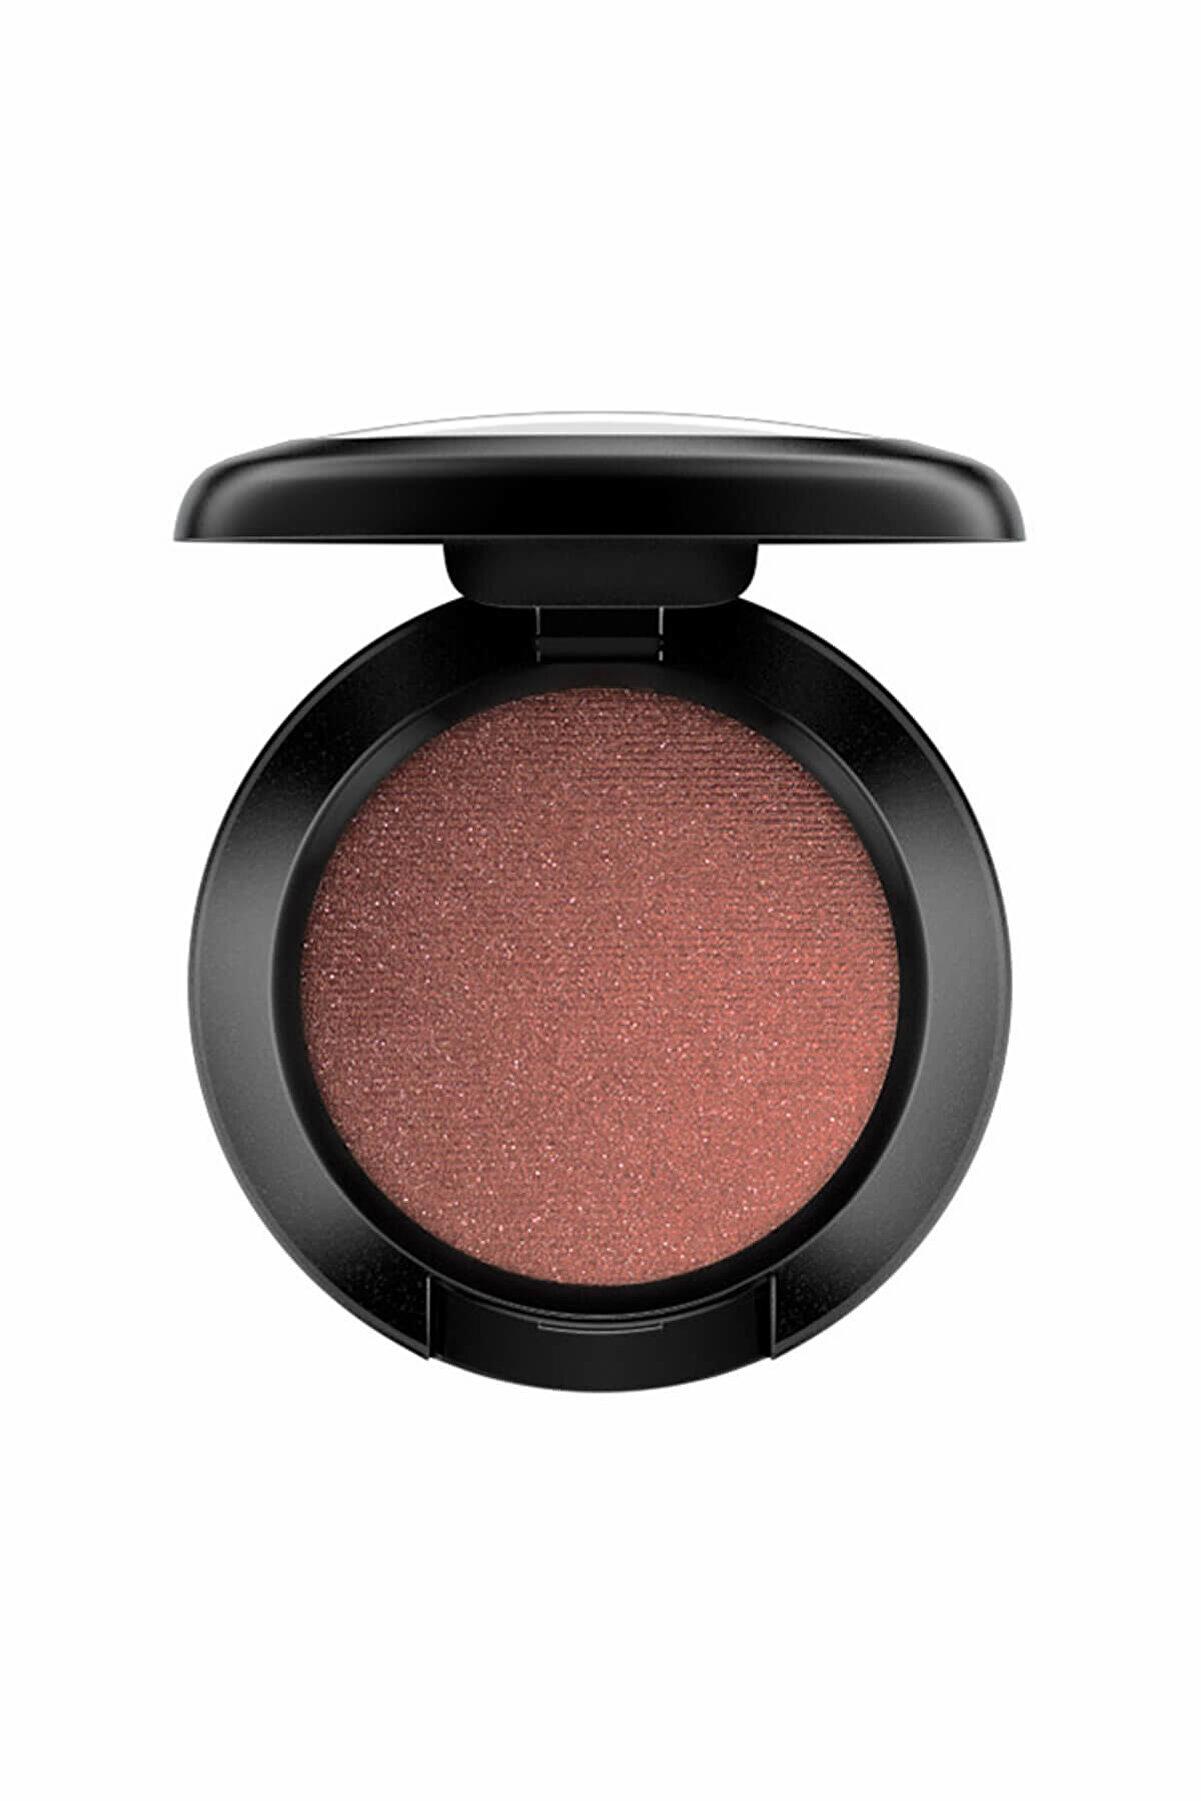 Mac Göz Farı - Eye Shadow Antiqued 1.5 g 773602077618